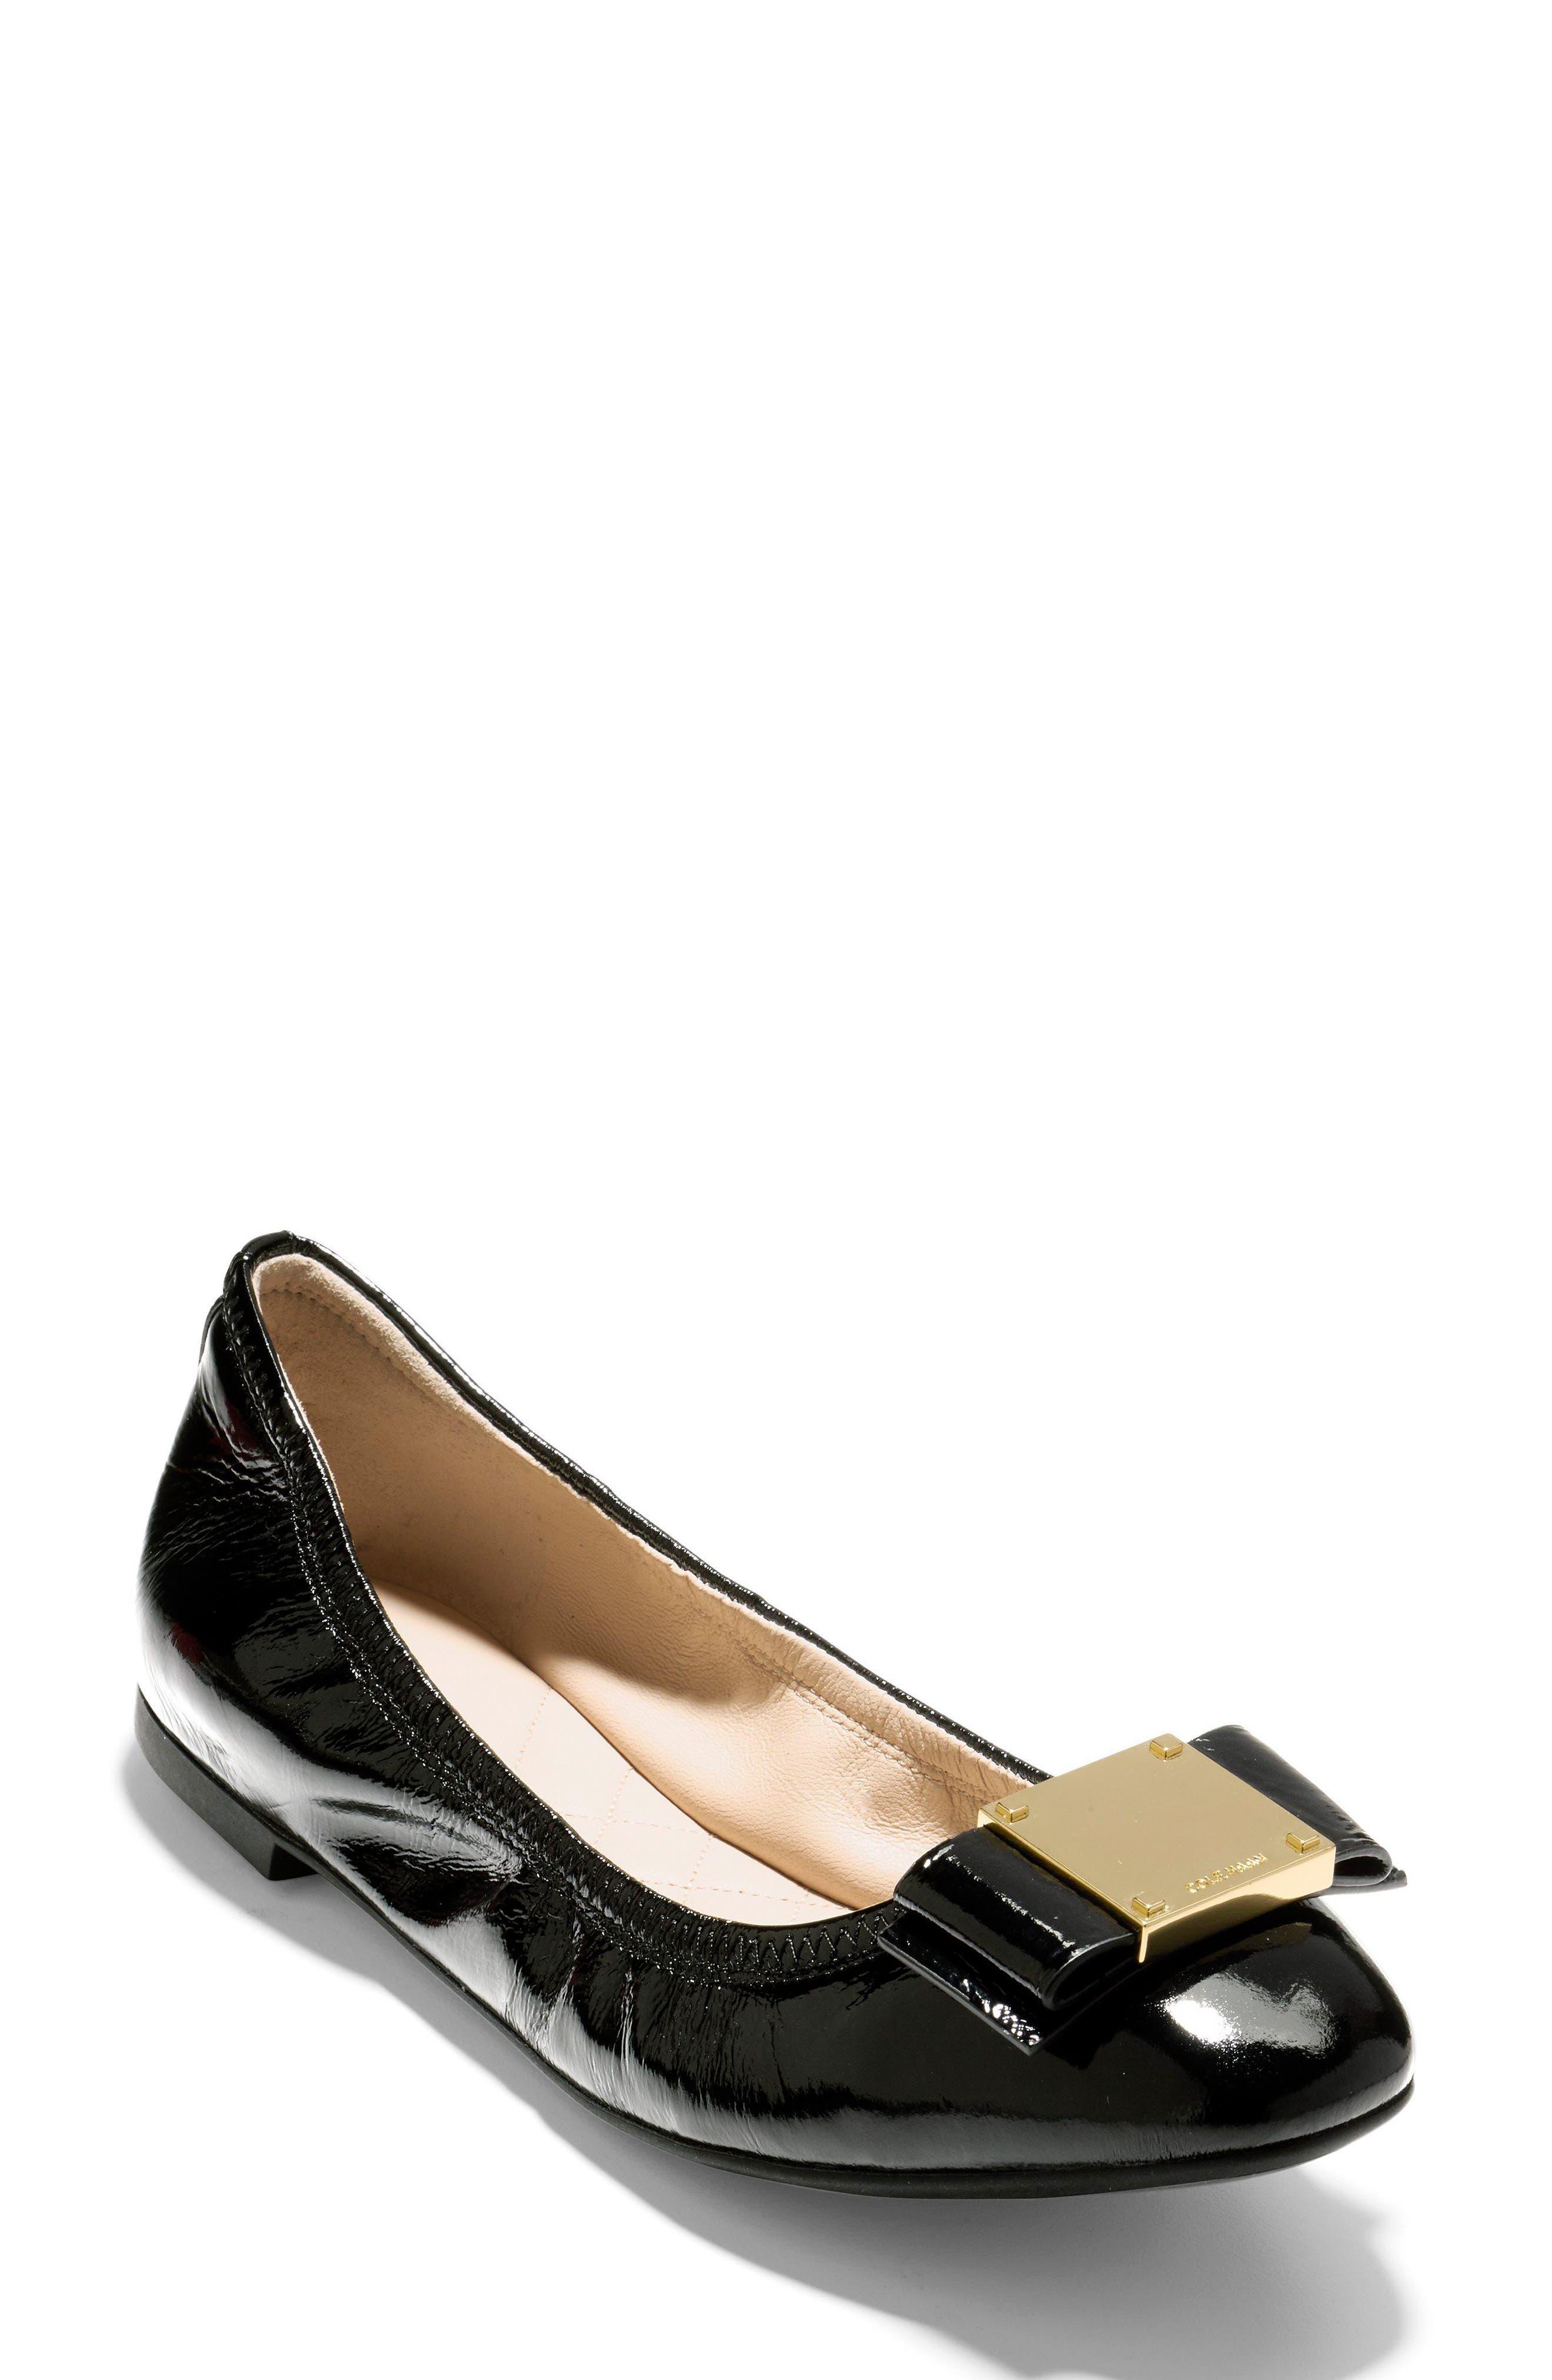 Tali Modern Bow Ballet Flat,                             Main thumbnail 1, color,                             001